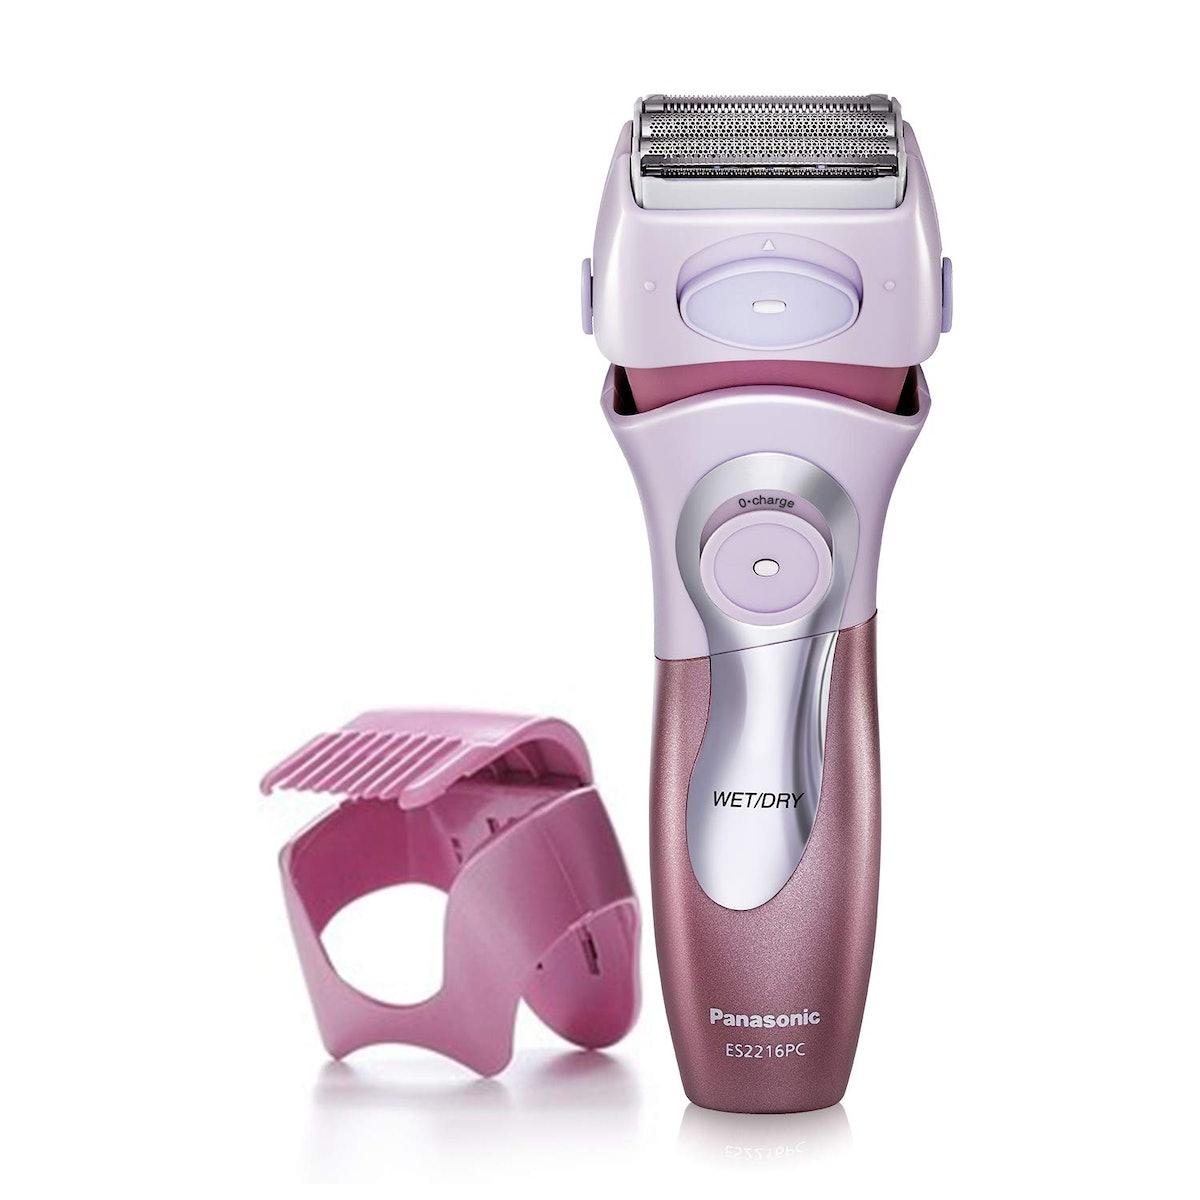 Panasonic Electric Shaver for Women